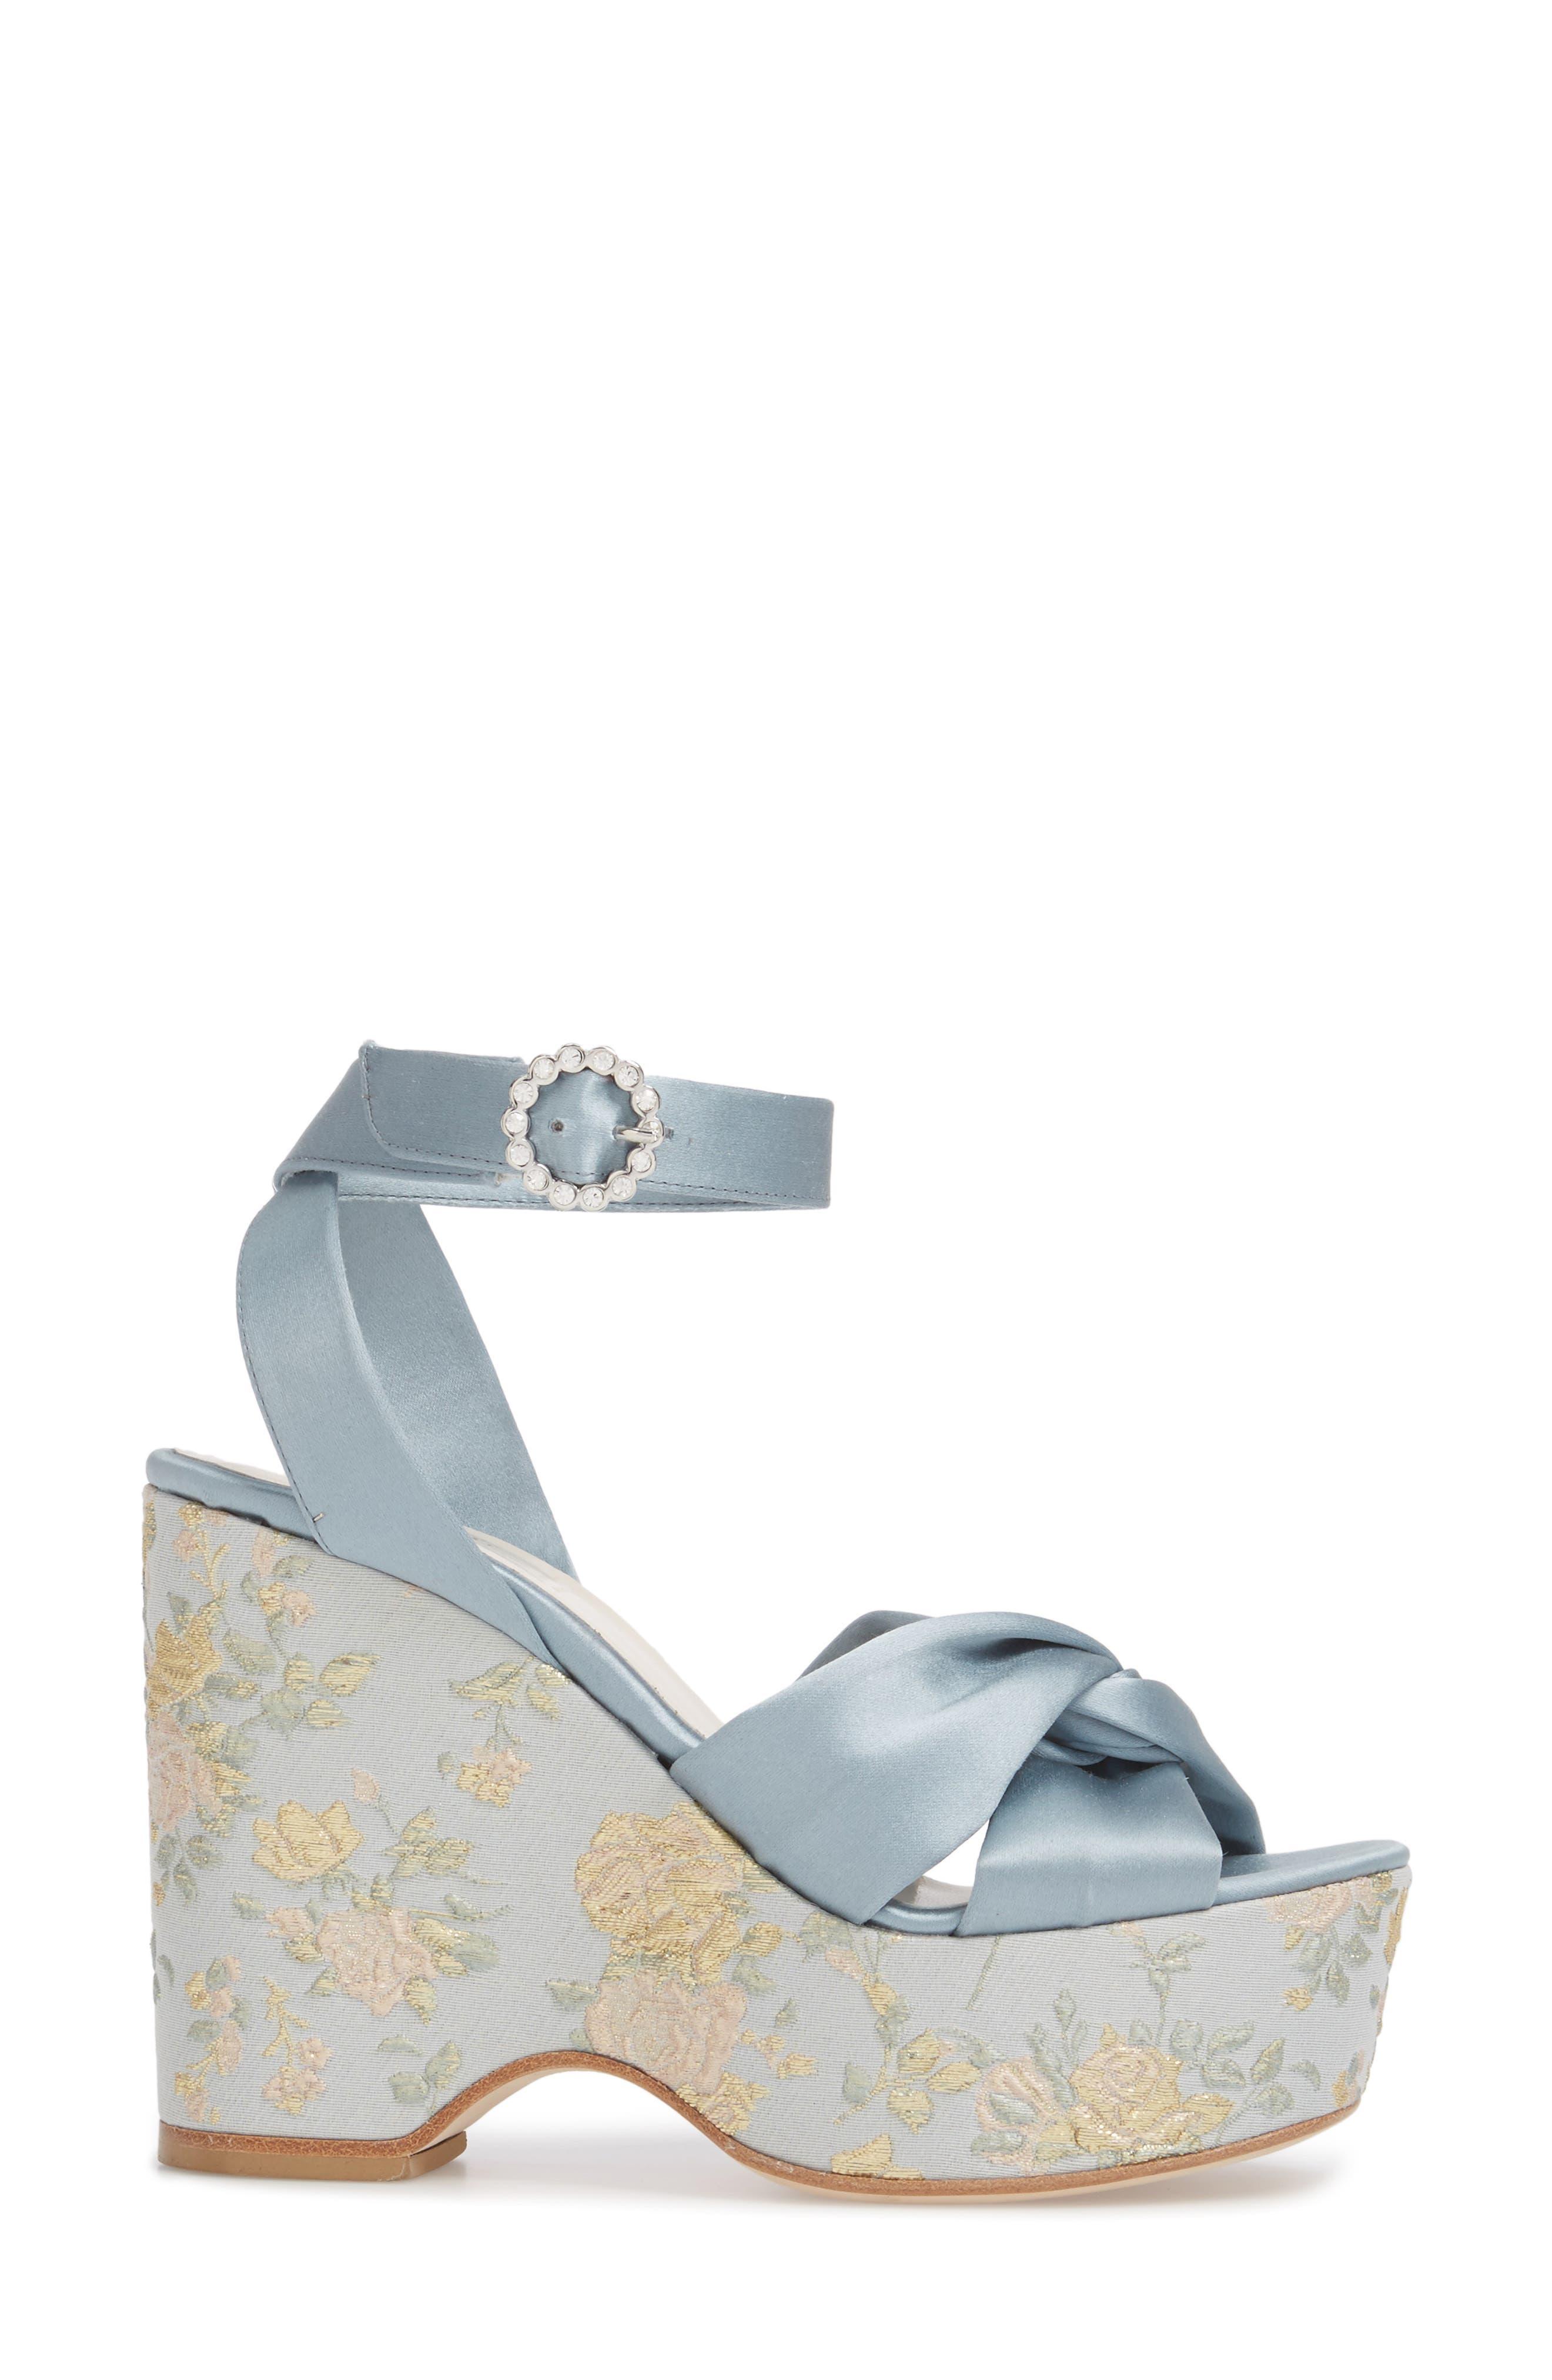 Serena Brocade Platform Sandal,                             Alternate thumbnail 3, color,                             Pearl Blue Satin